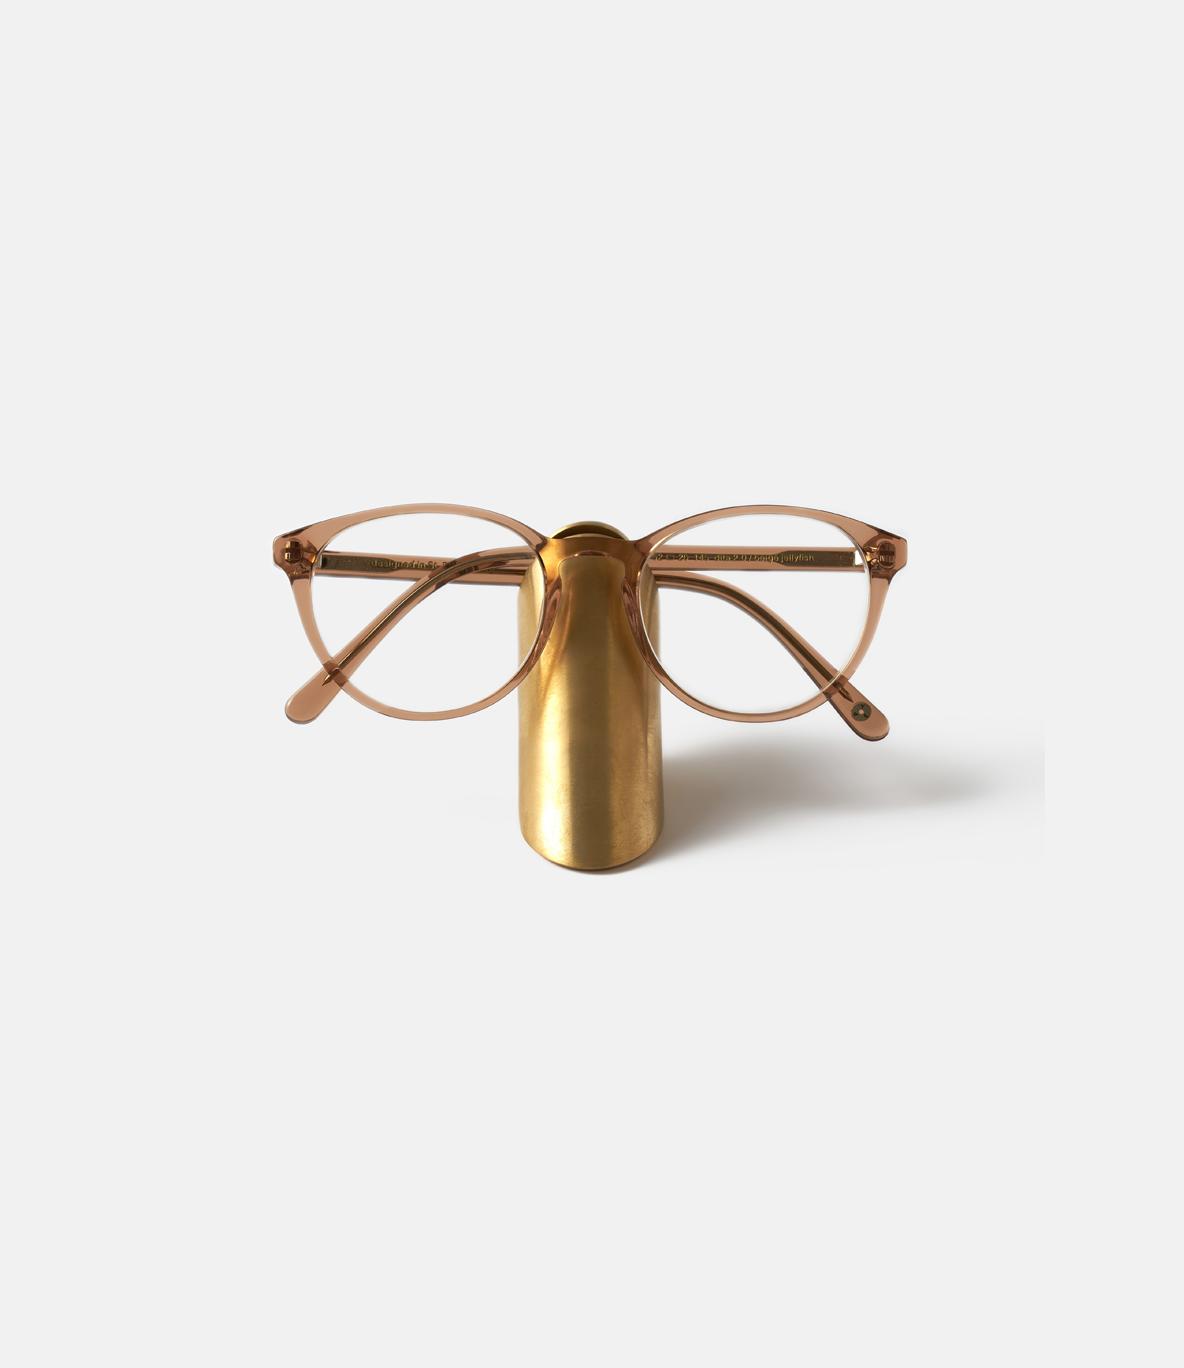 Craighill Eyewear Stand — подставка для очков